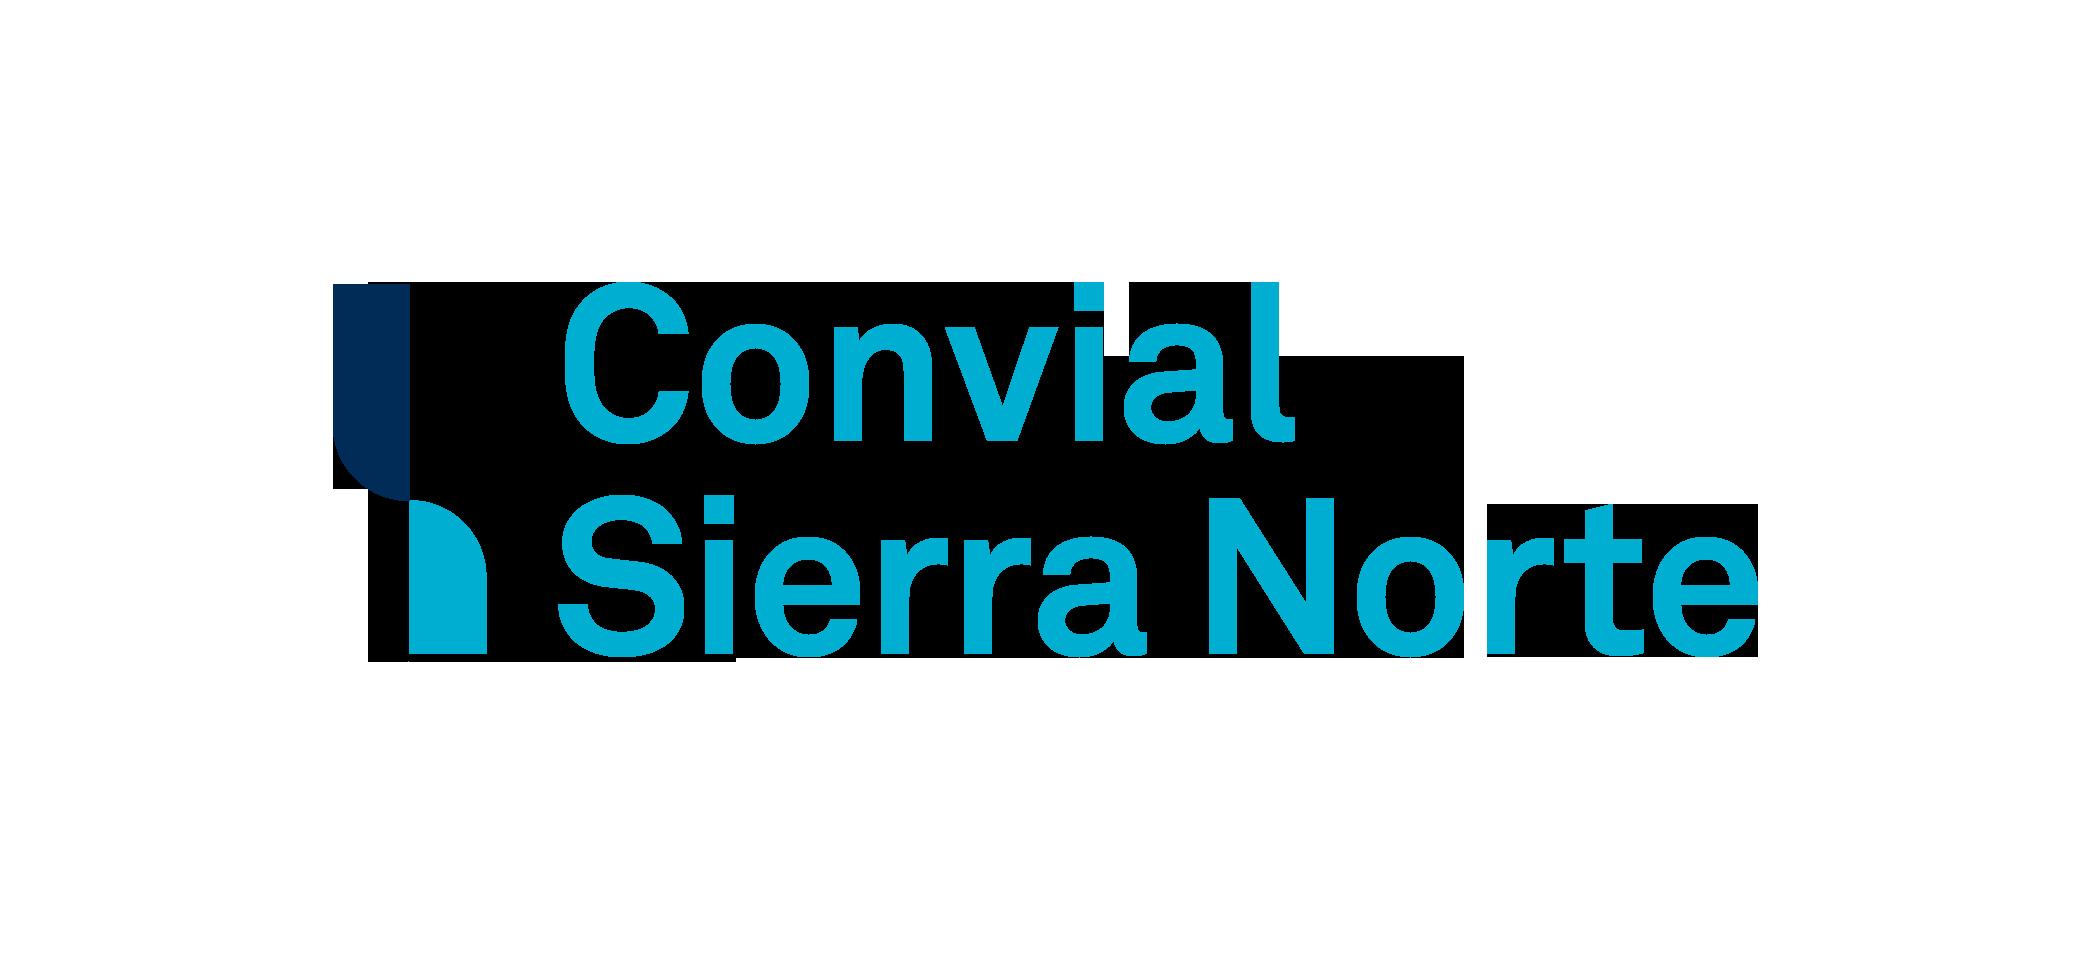 Convial Sierra Norte